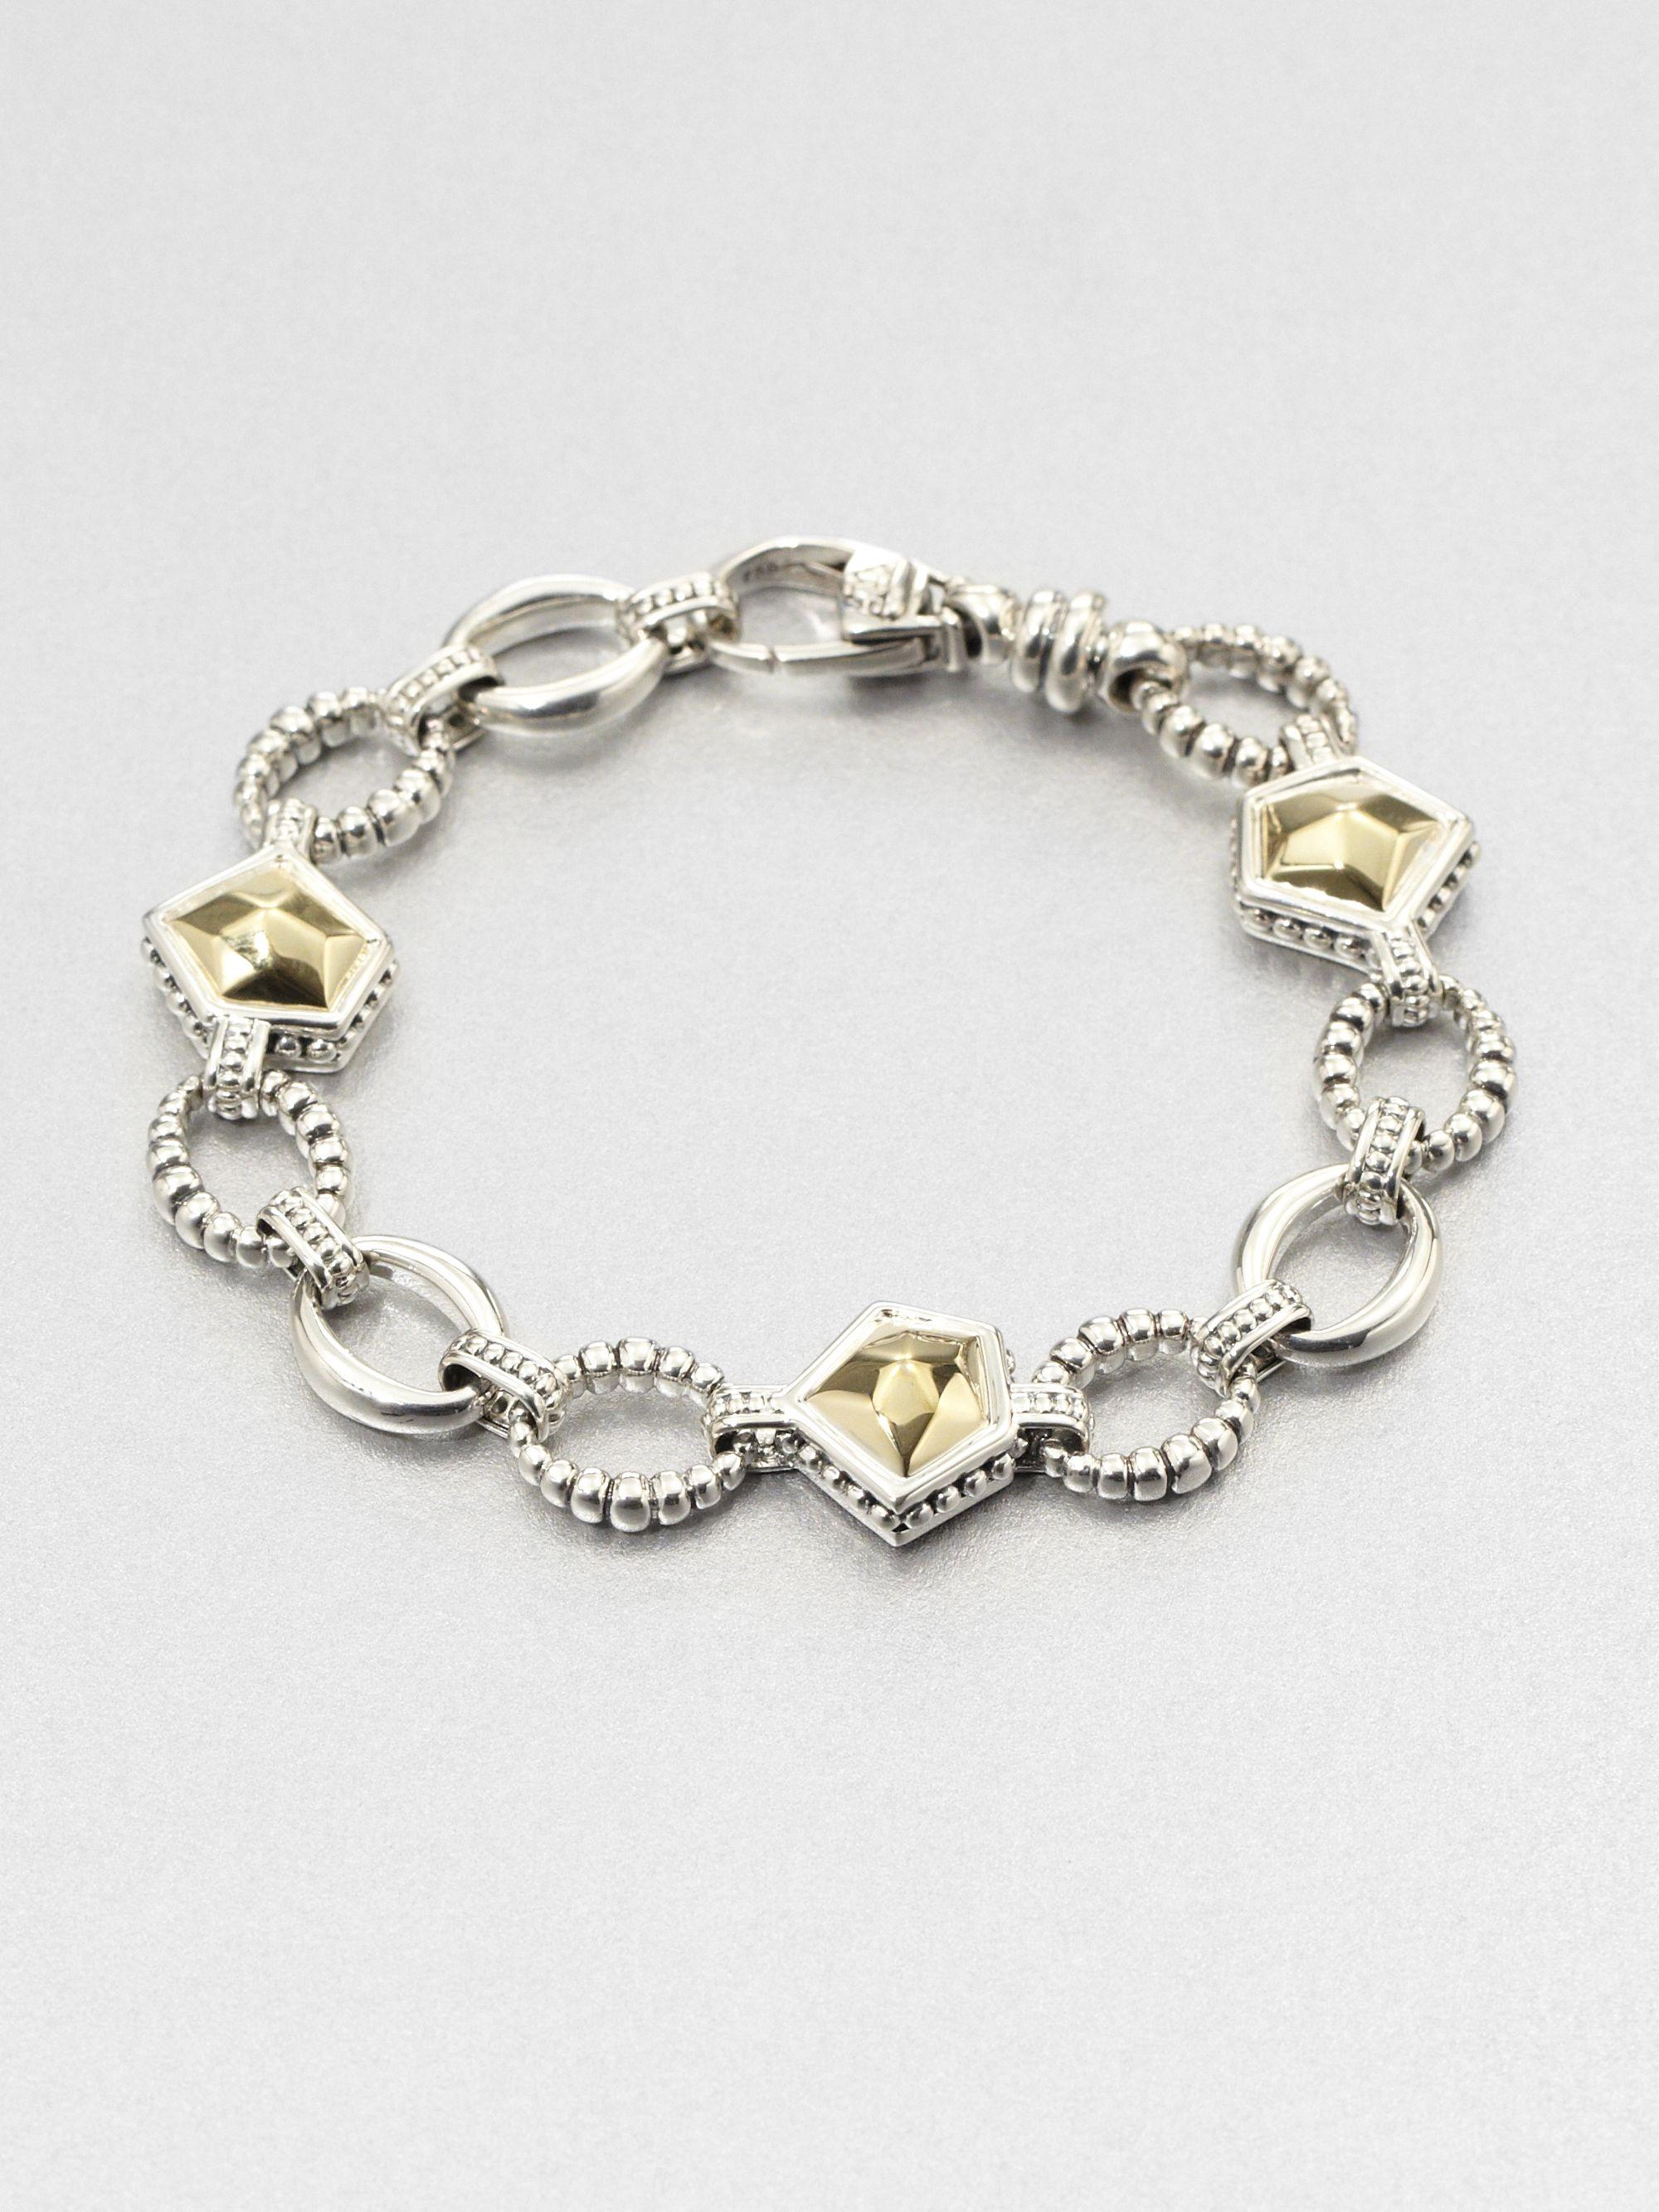 Lagos 18k Gold And Sterling Silver Rock Link Bracelet In